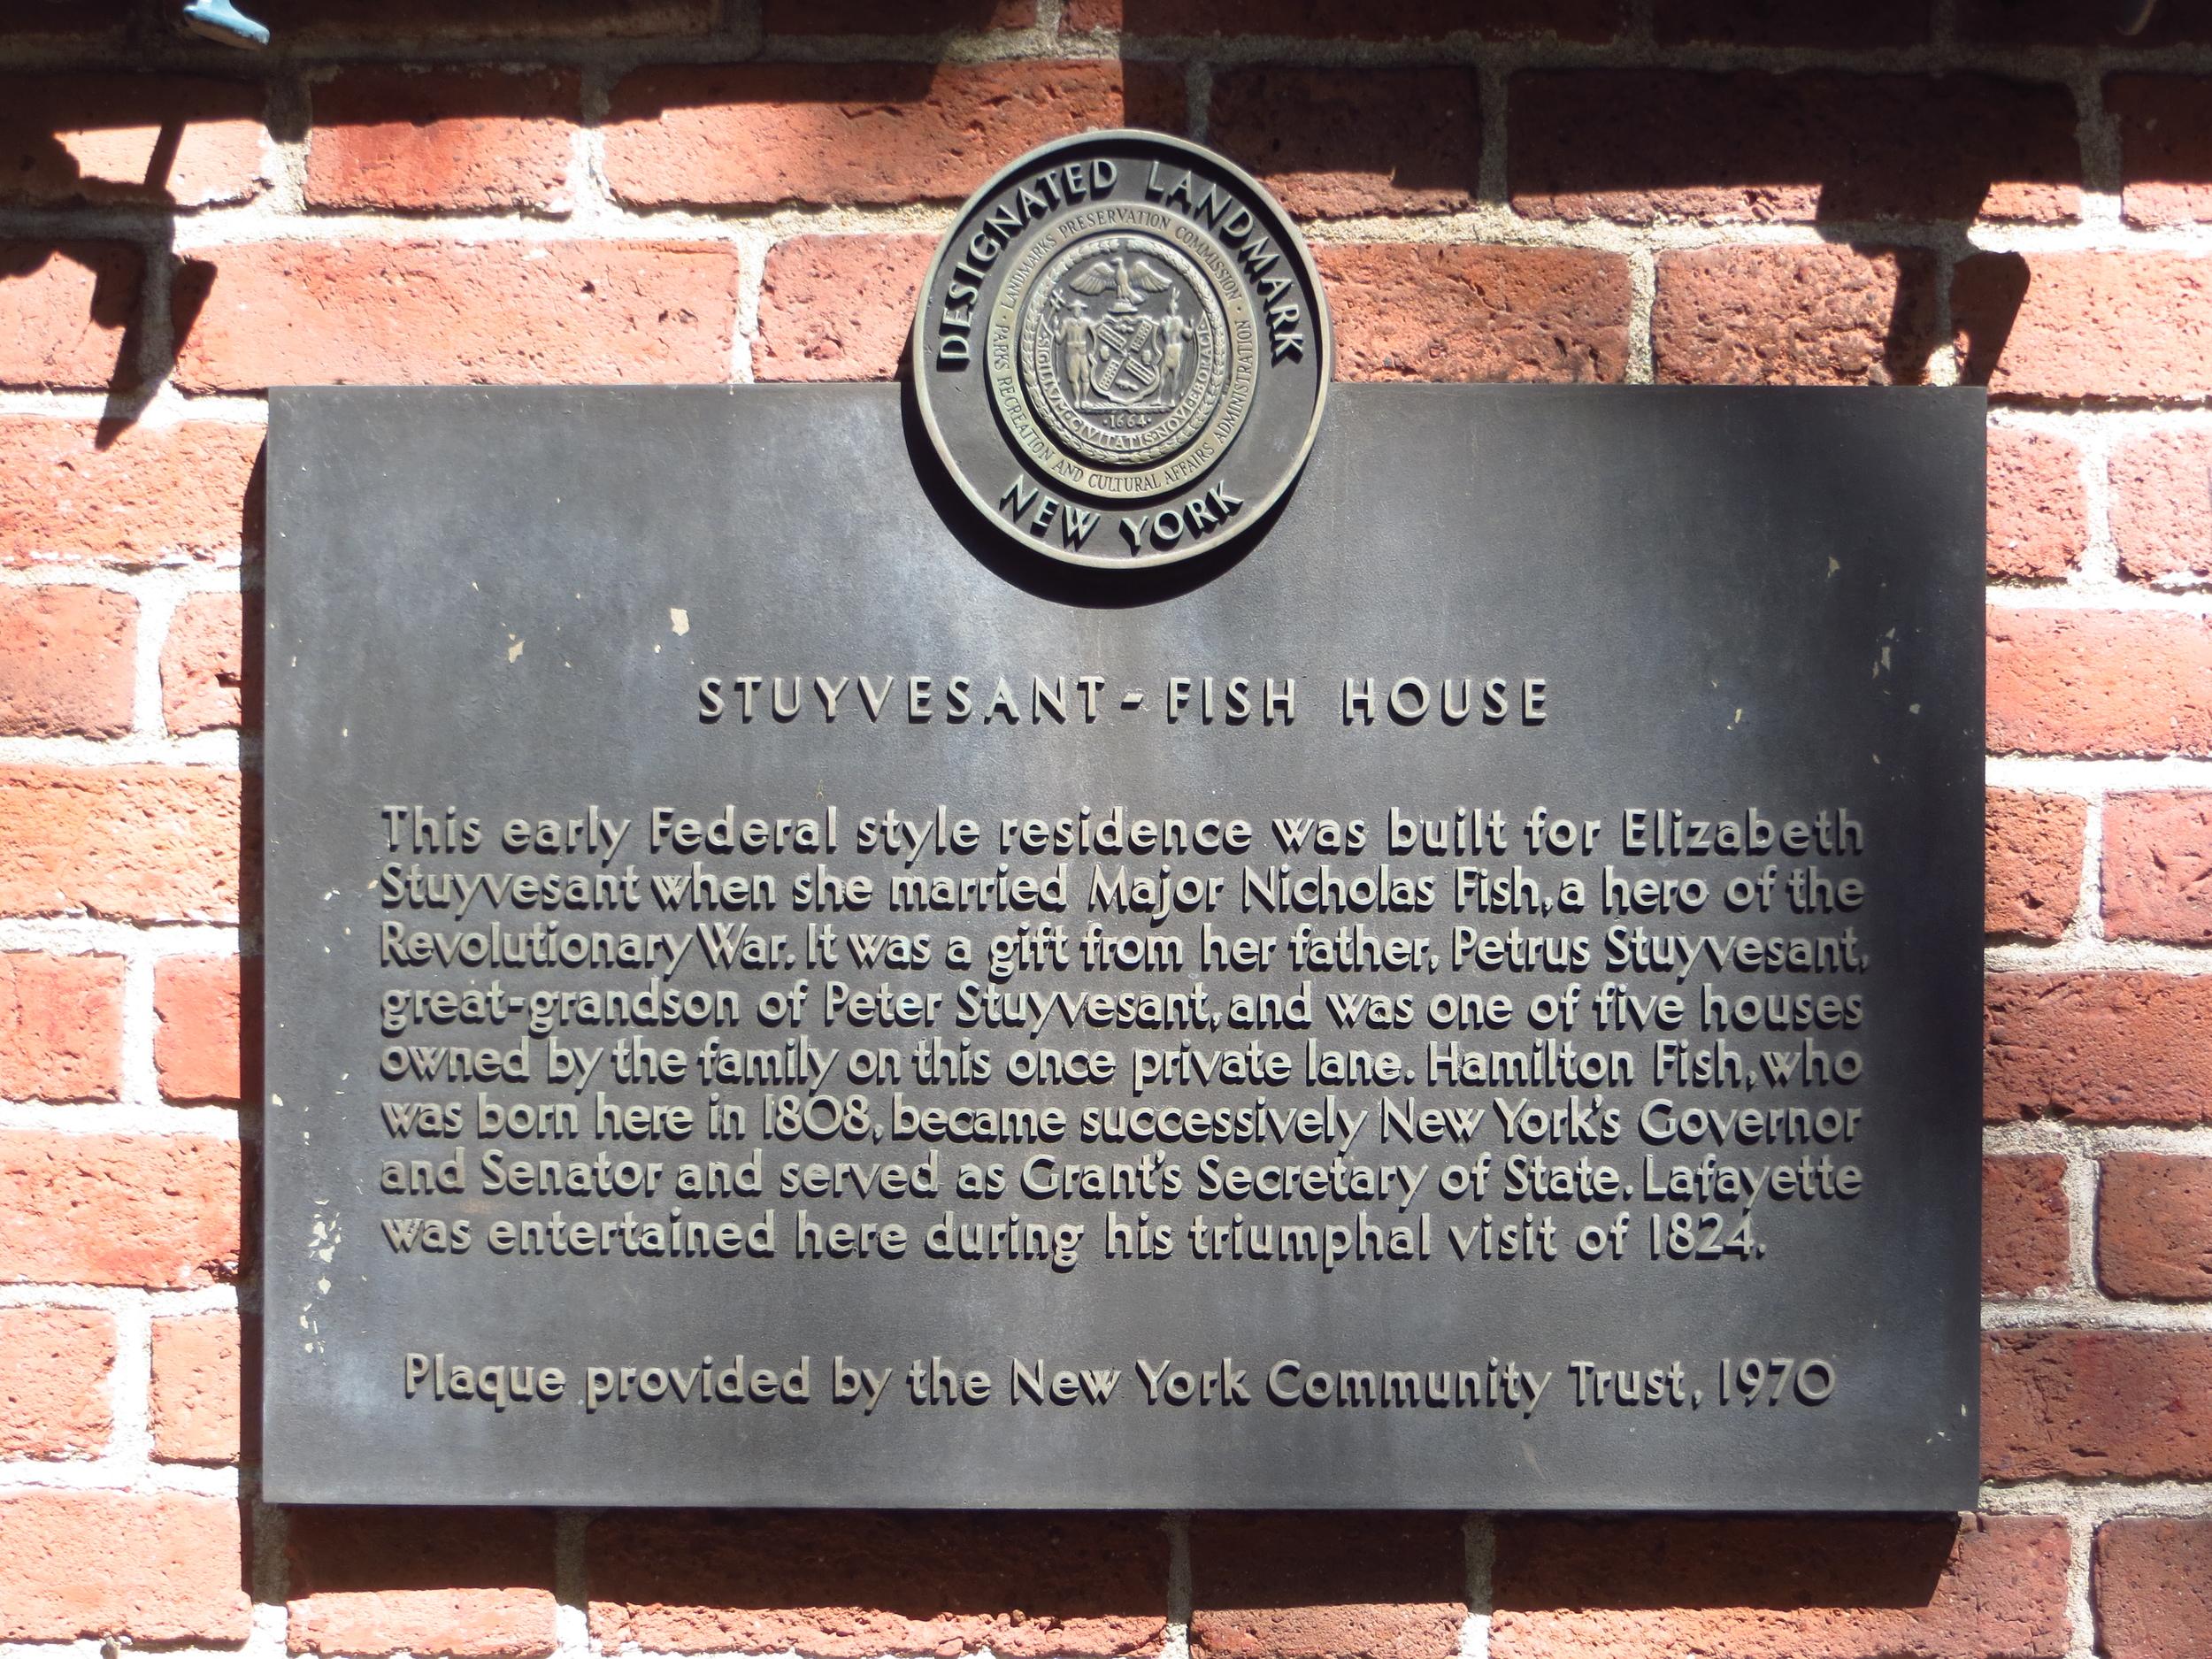 Stuyvesant-Fish House history